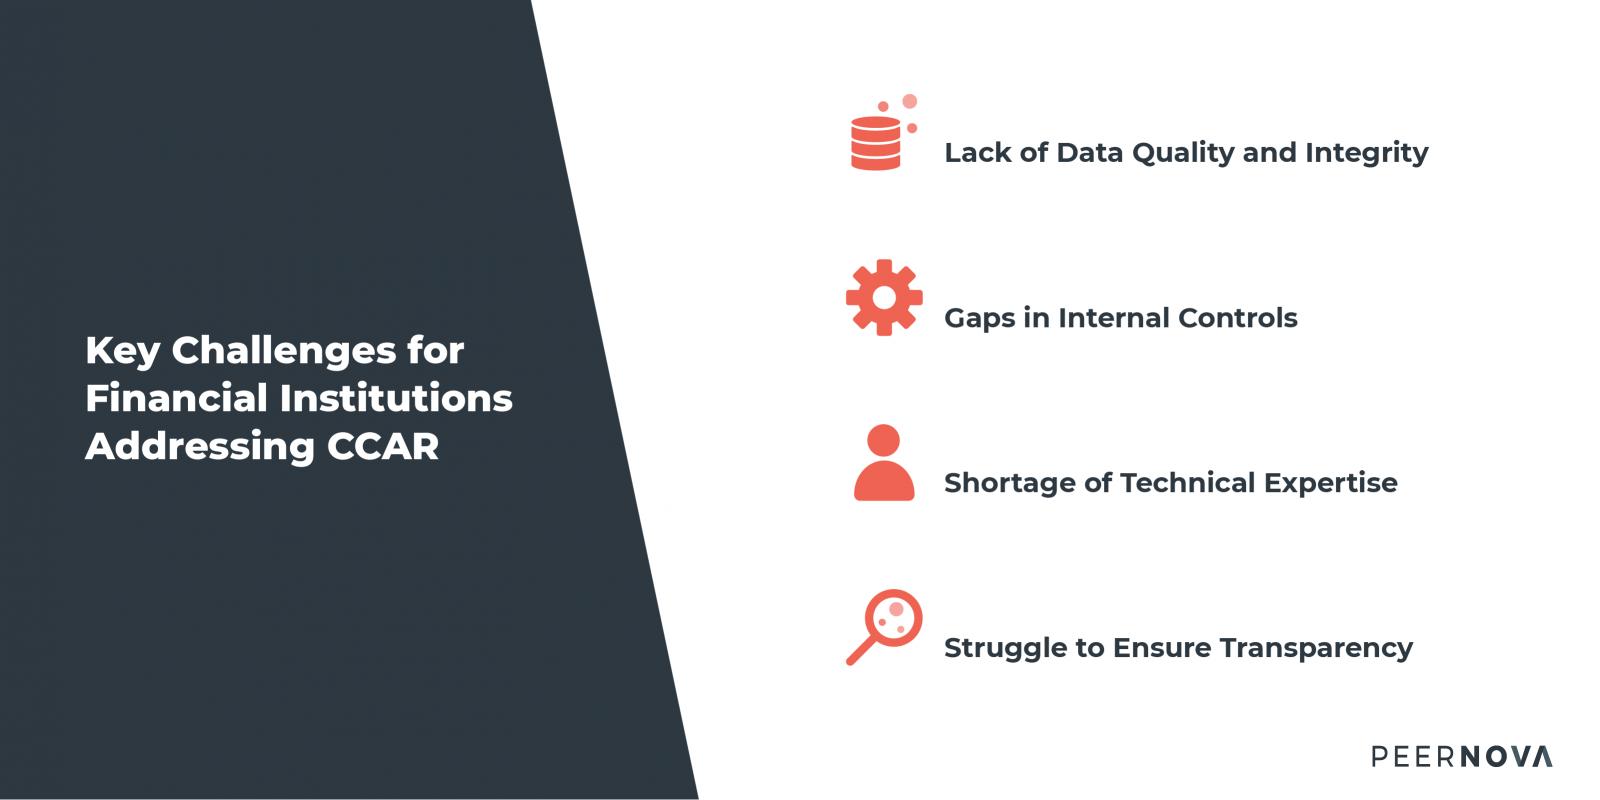 CCAR regulatory compliance challenges